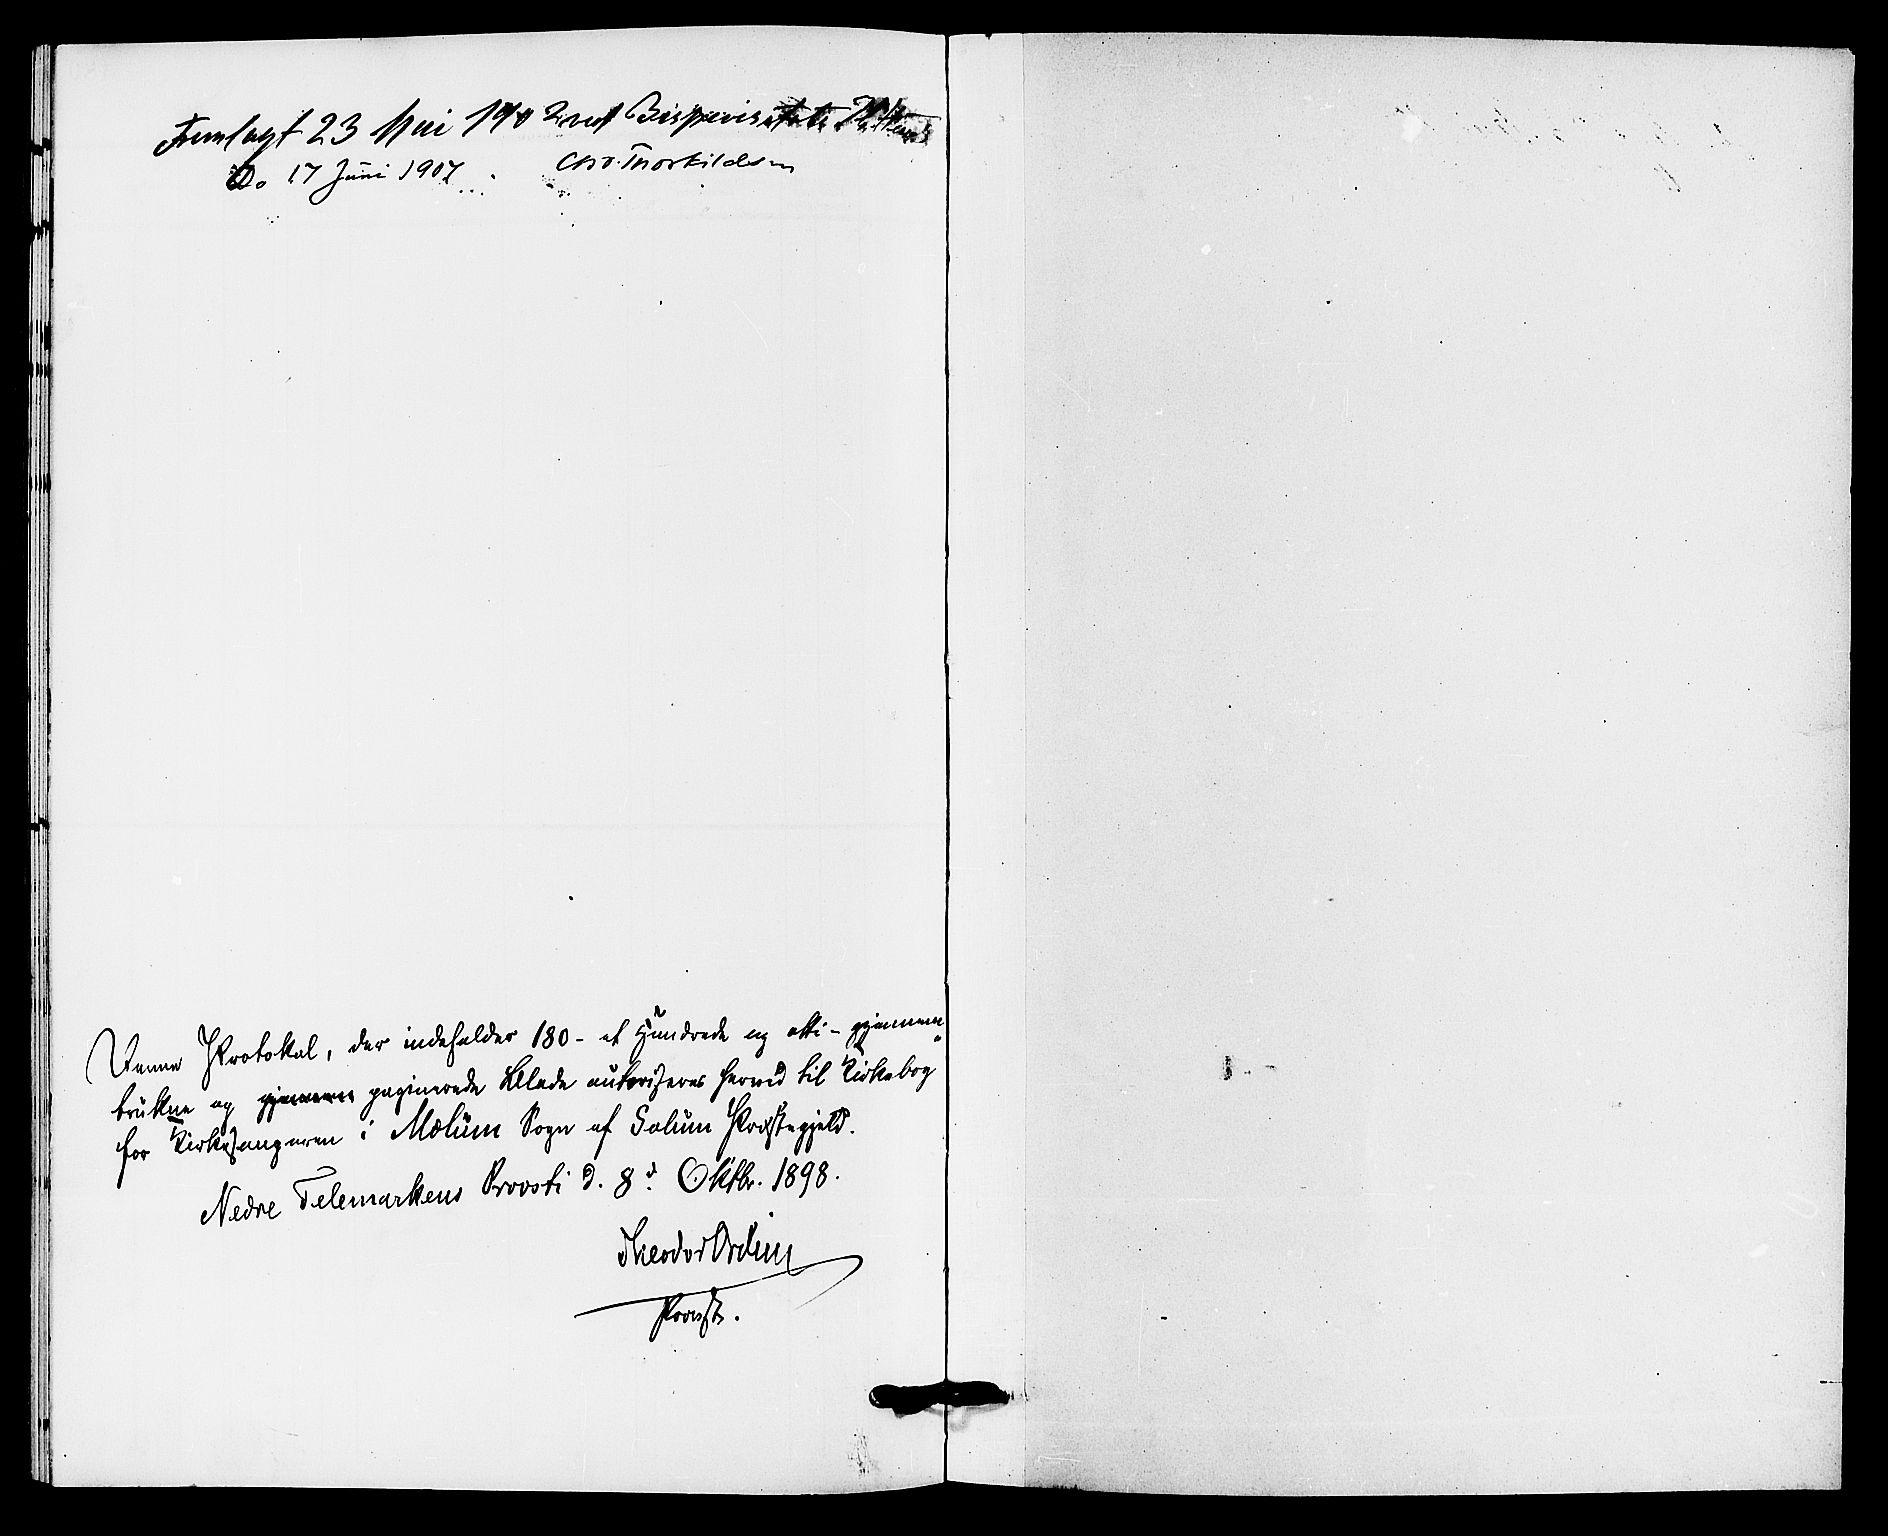 SAKO, Solum kirkebøker, G/Gb/L0004: Klokkerbok nr. II 4, 1898-1905